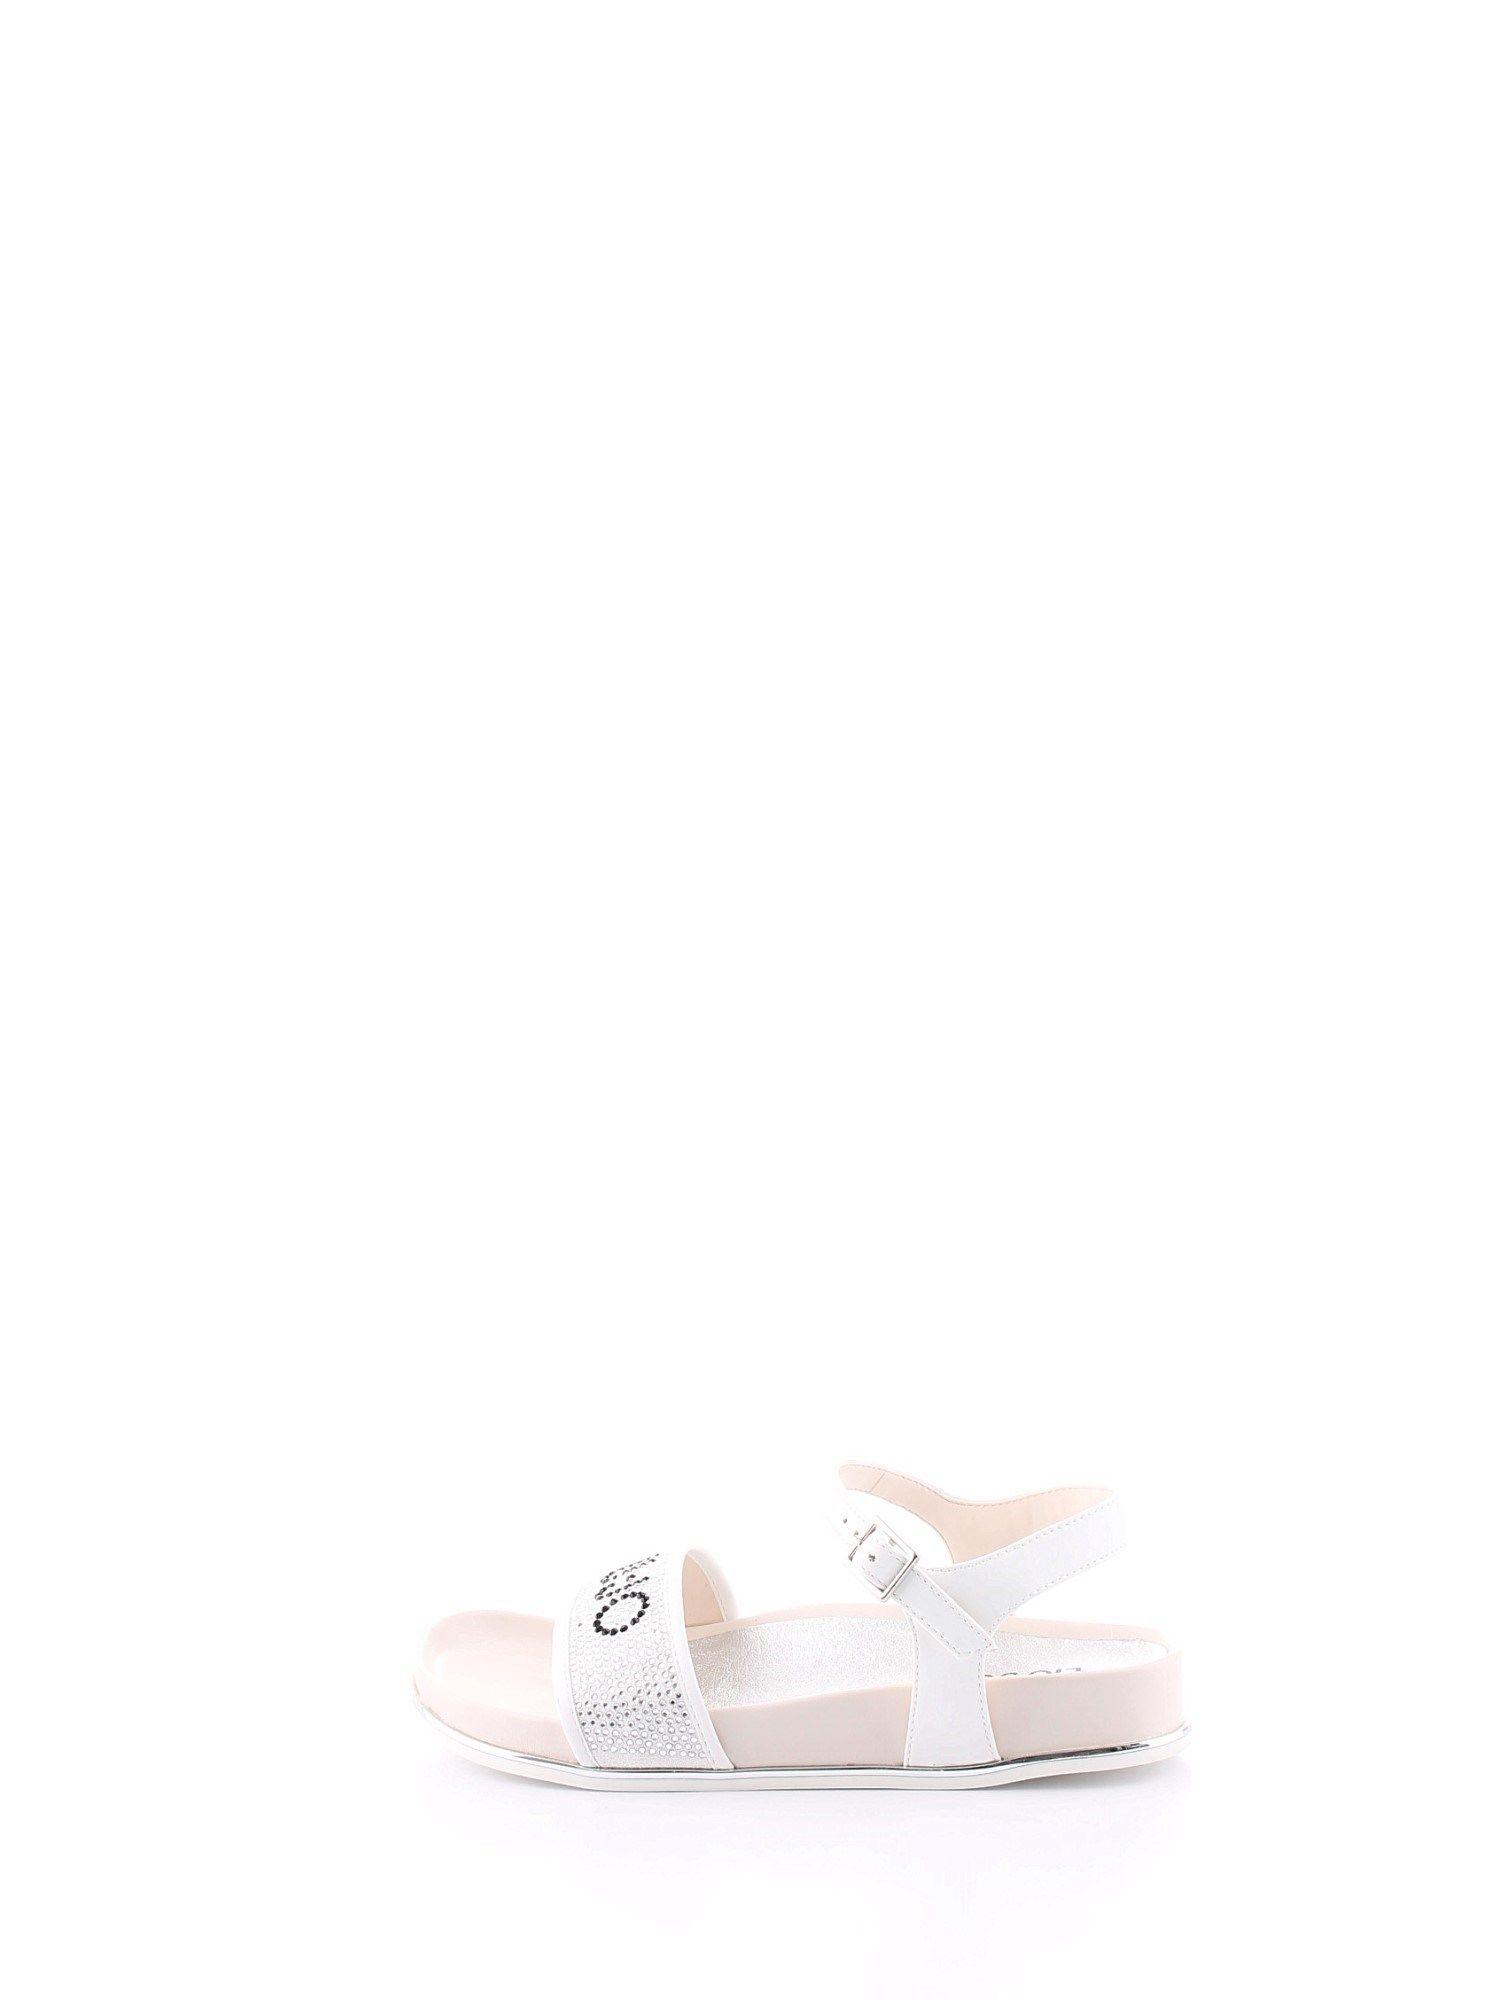 LIU JO WOMEN'S 4A0777EX014S1400 WHITE SYNTHETIC FIBERS SANDALS